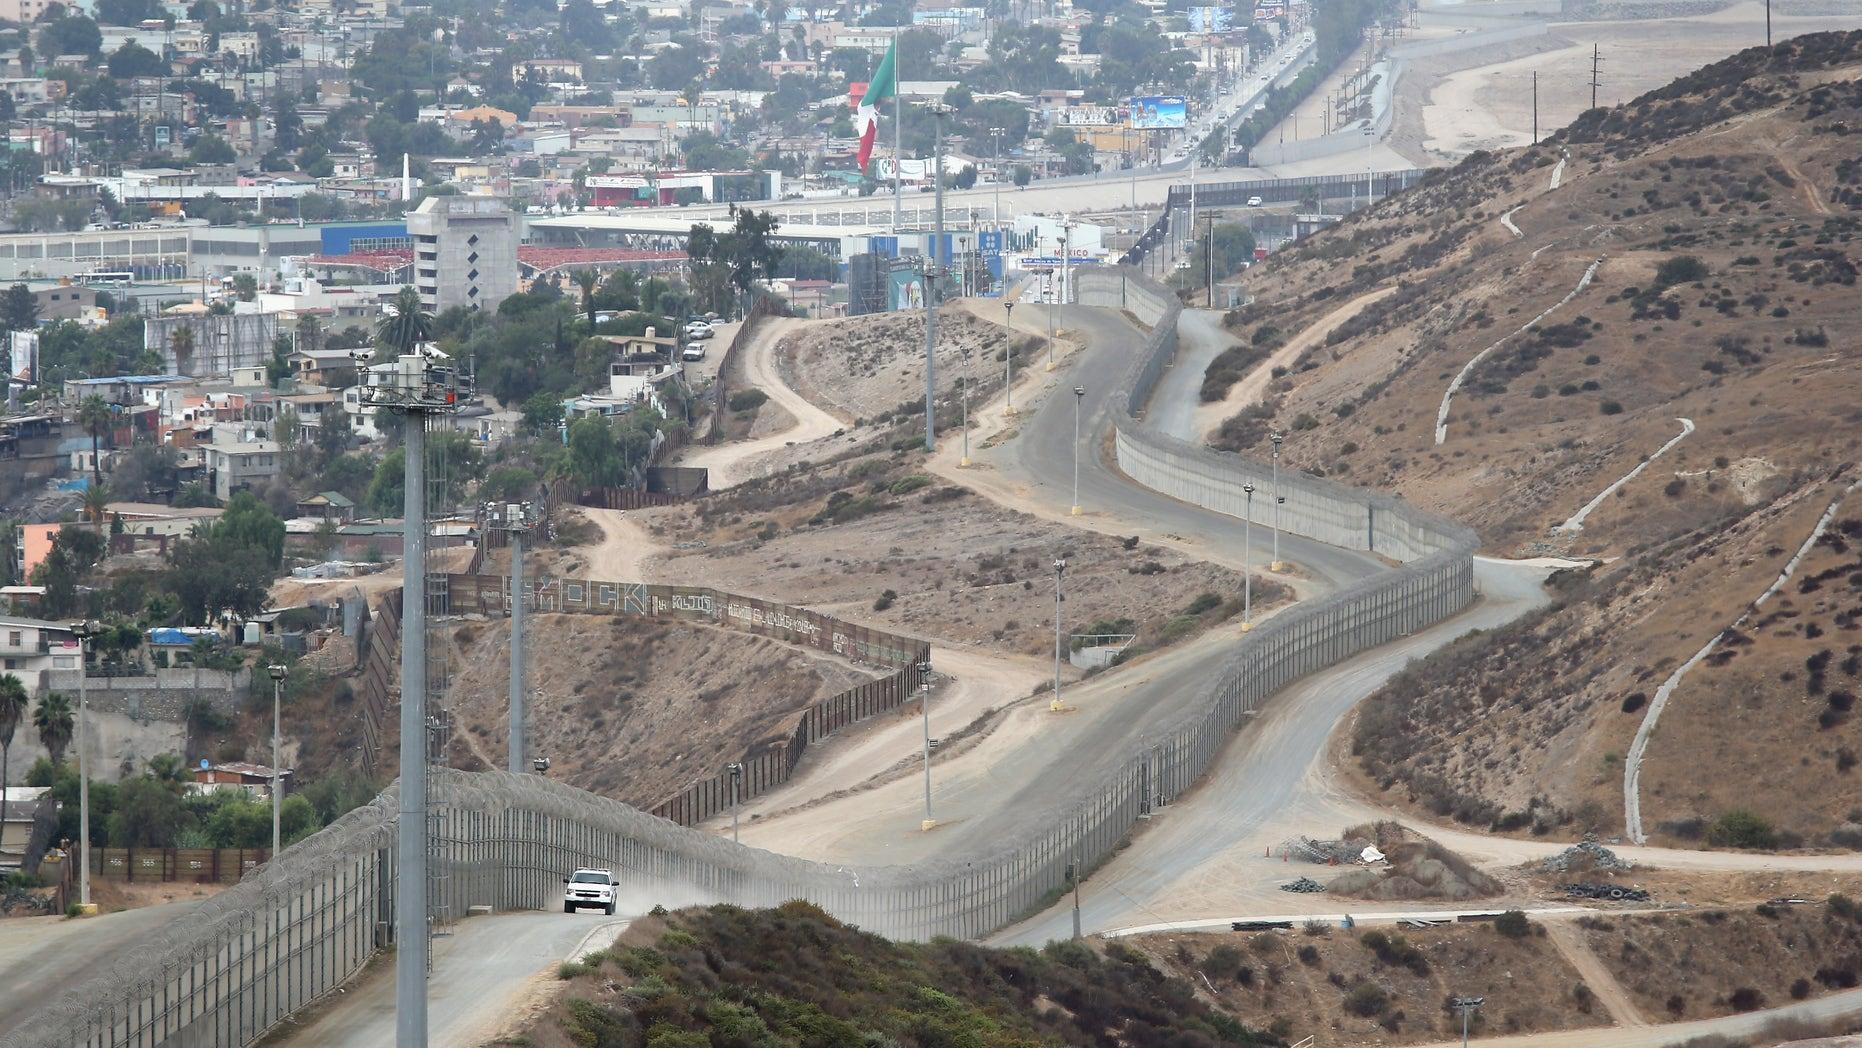 A stretch of the U.S.-Mexico border fence on October 3, 2013 near San Ysidro, California.